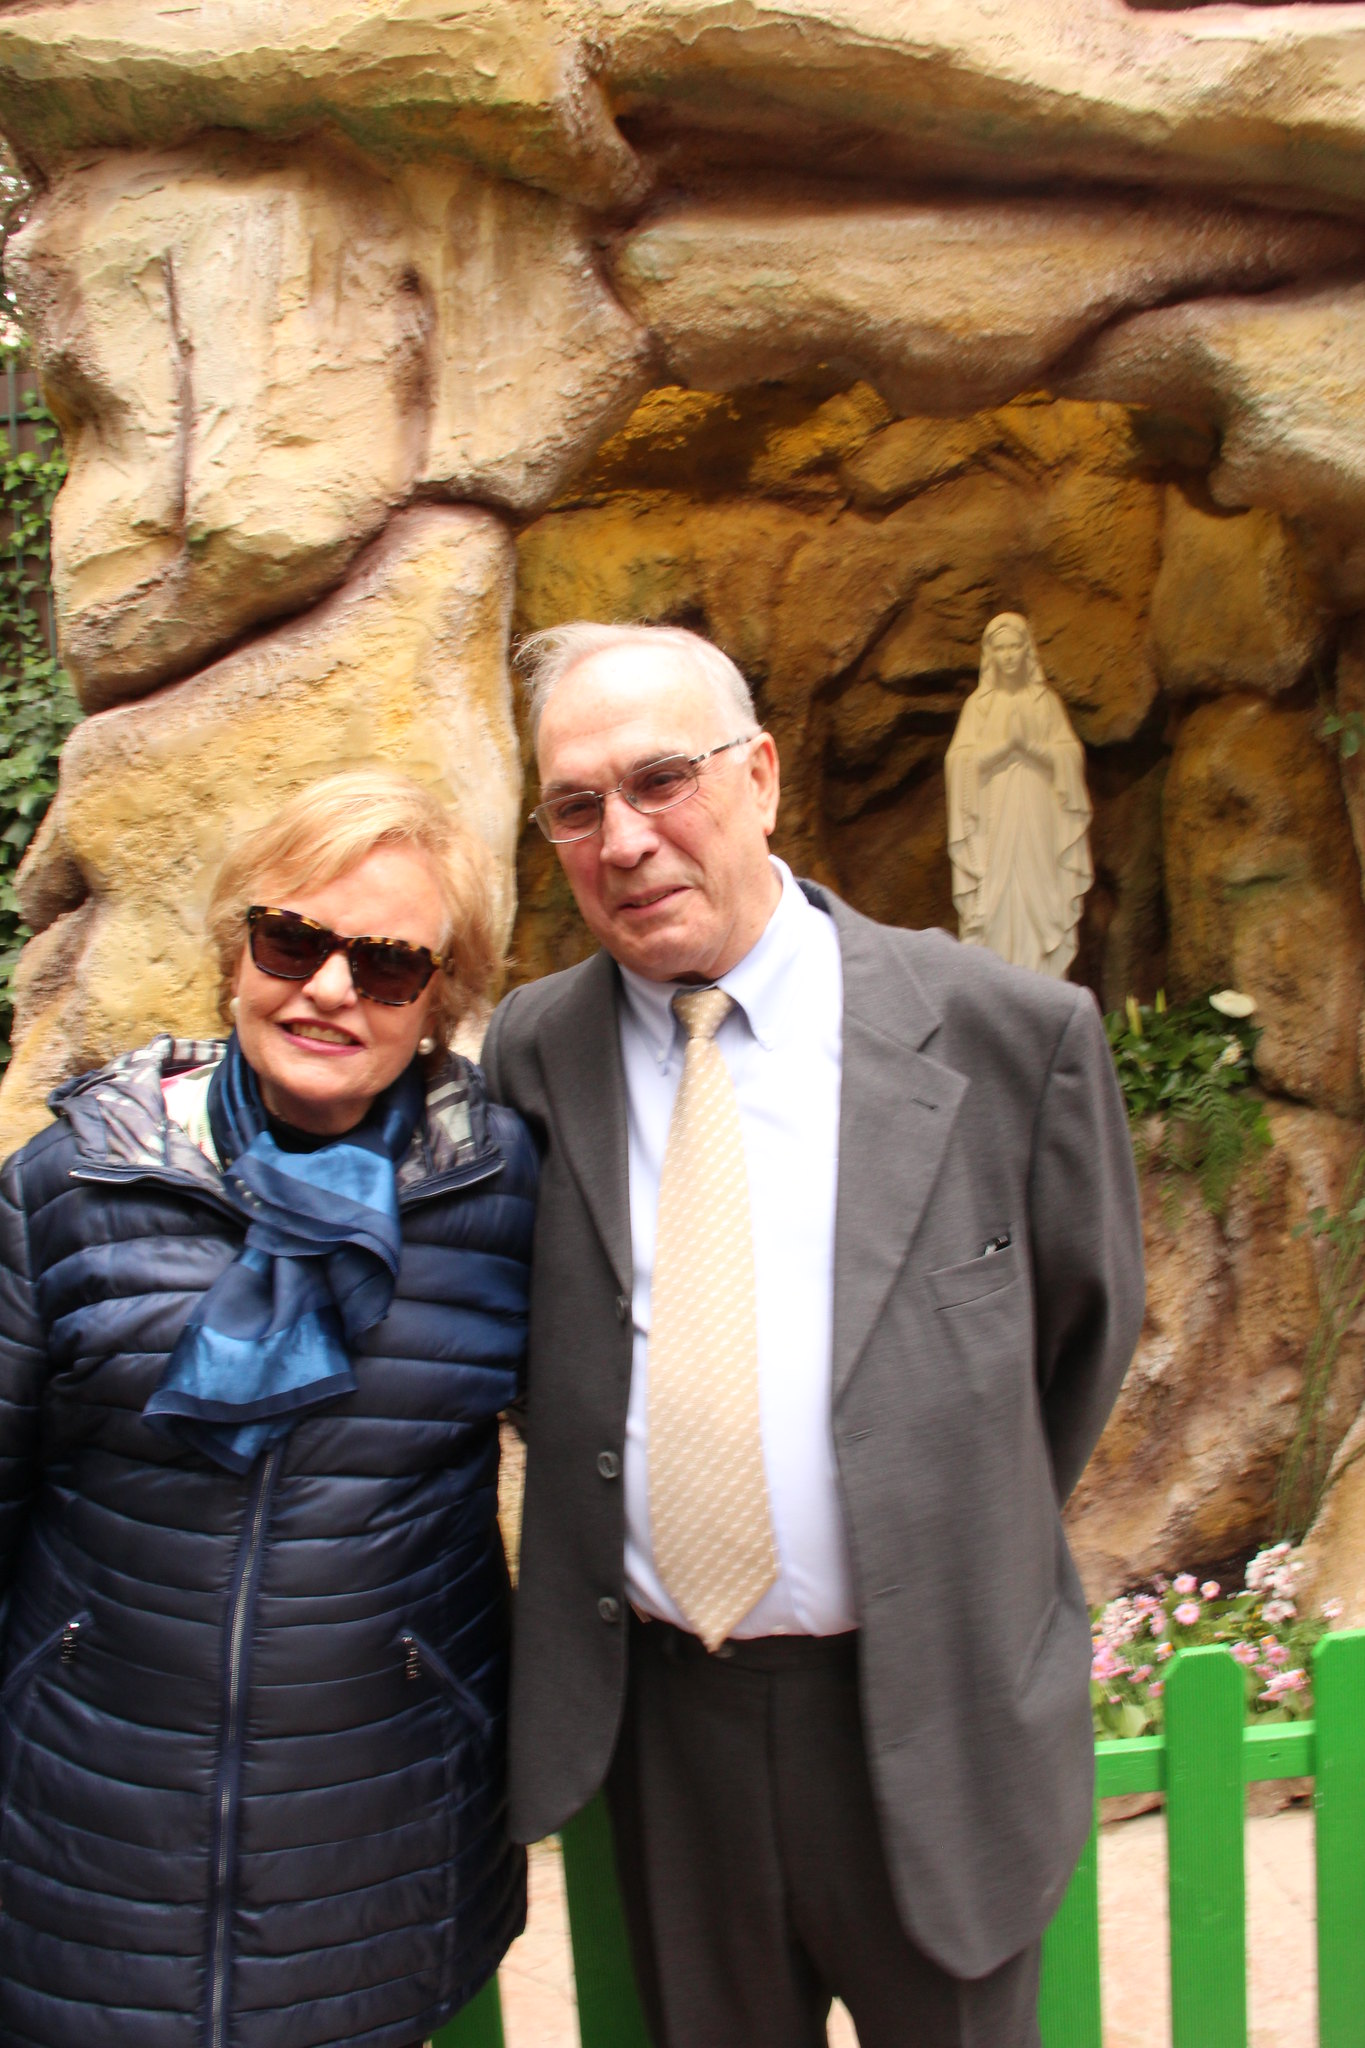 (2016-02-13) - Inauguración Virgen De Lourdes, La Molineta - Archivo La Molineta (100)